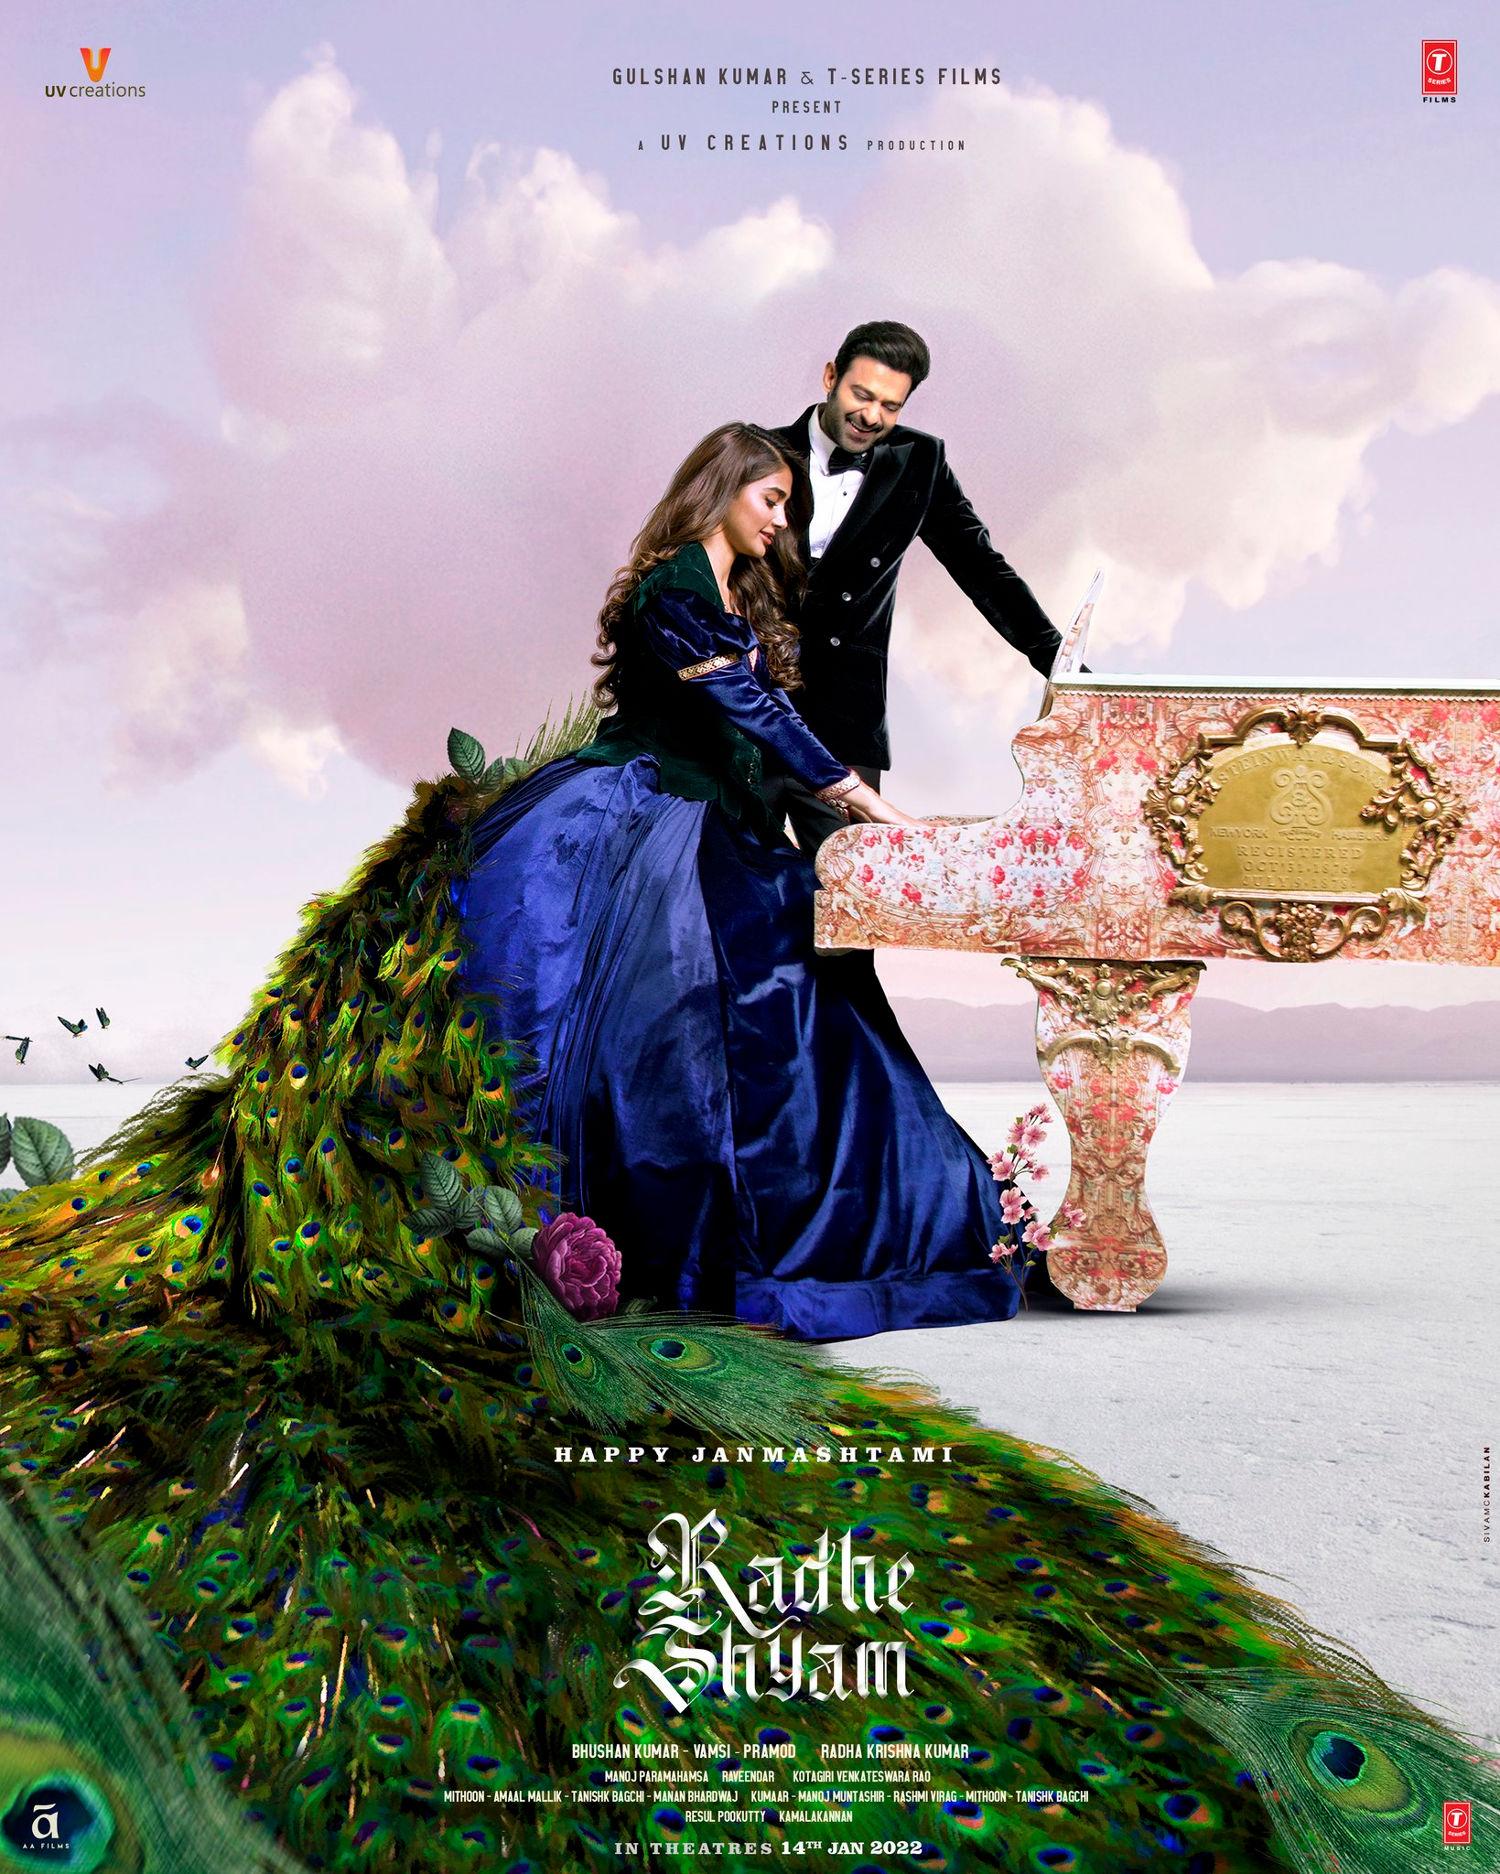 Radhe Shyam Janamashtami Special Poster HD